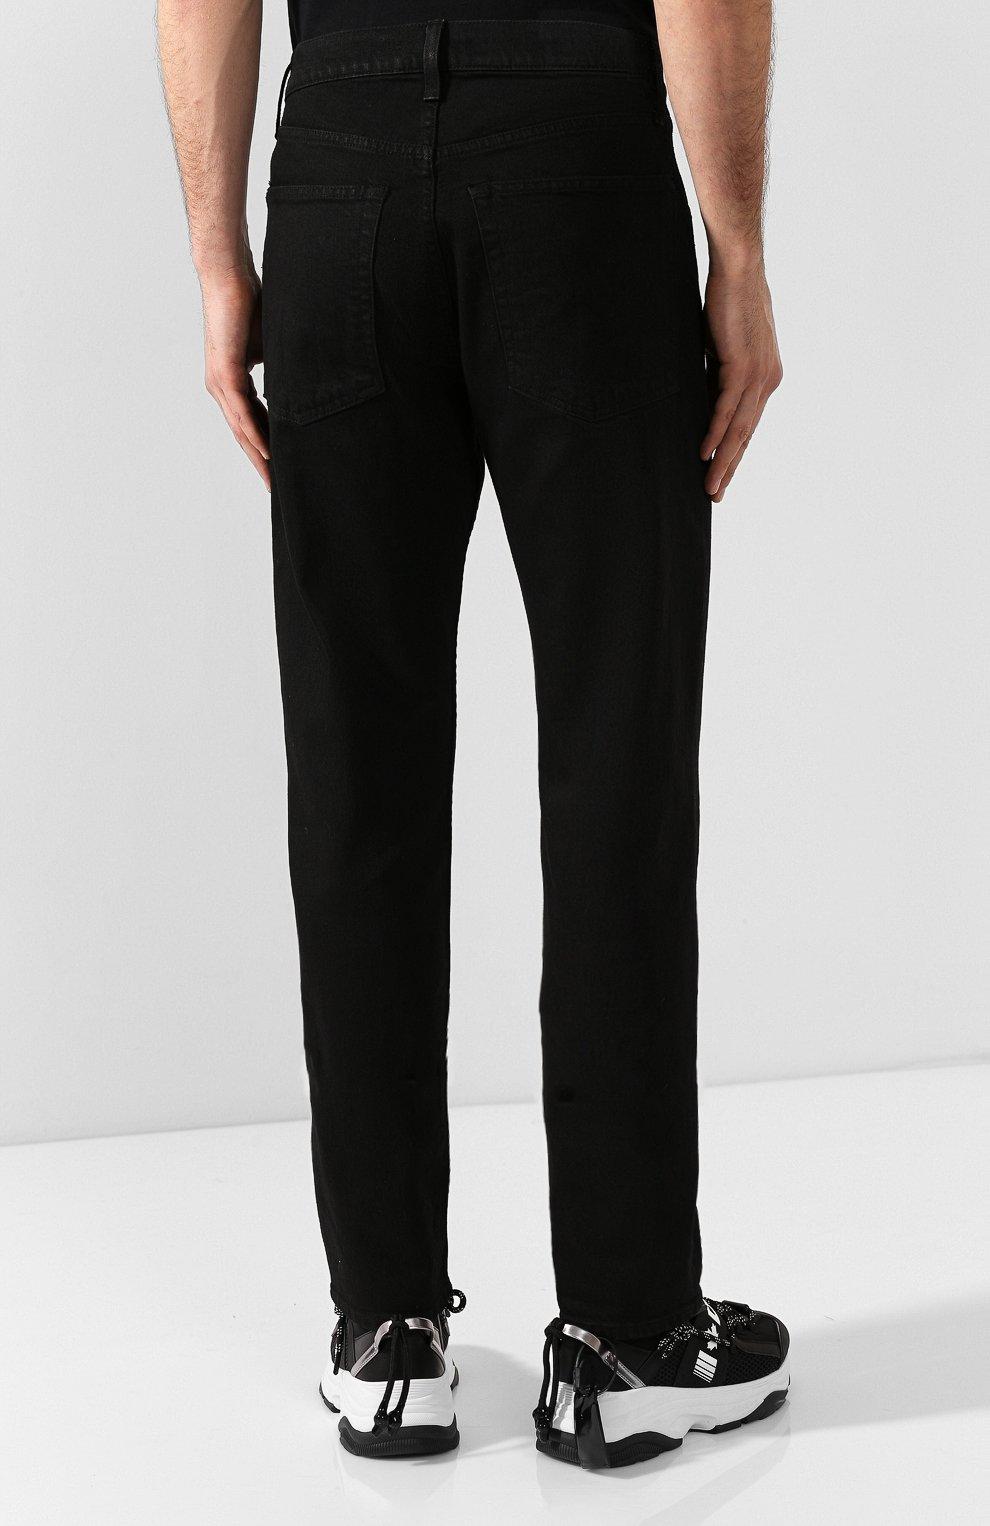 Мужские джинсы HELMUT LANG черного цвета, арт. I07DM209 | Фото 4